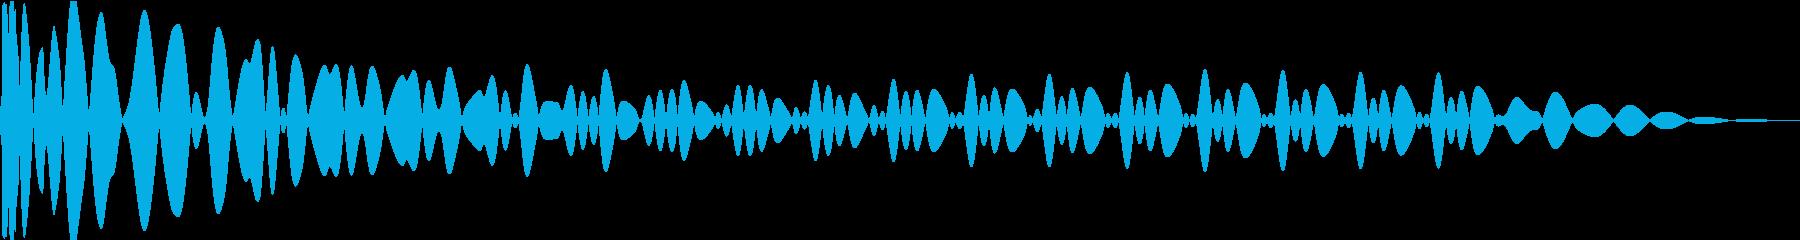 EDMキック キーFの再生済みの波形